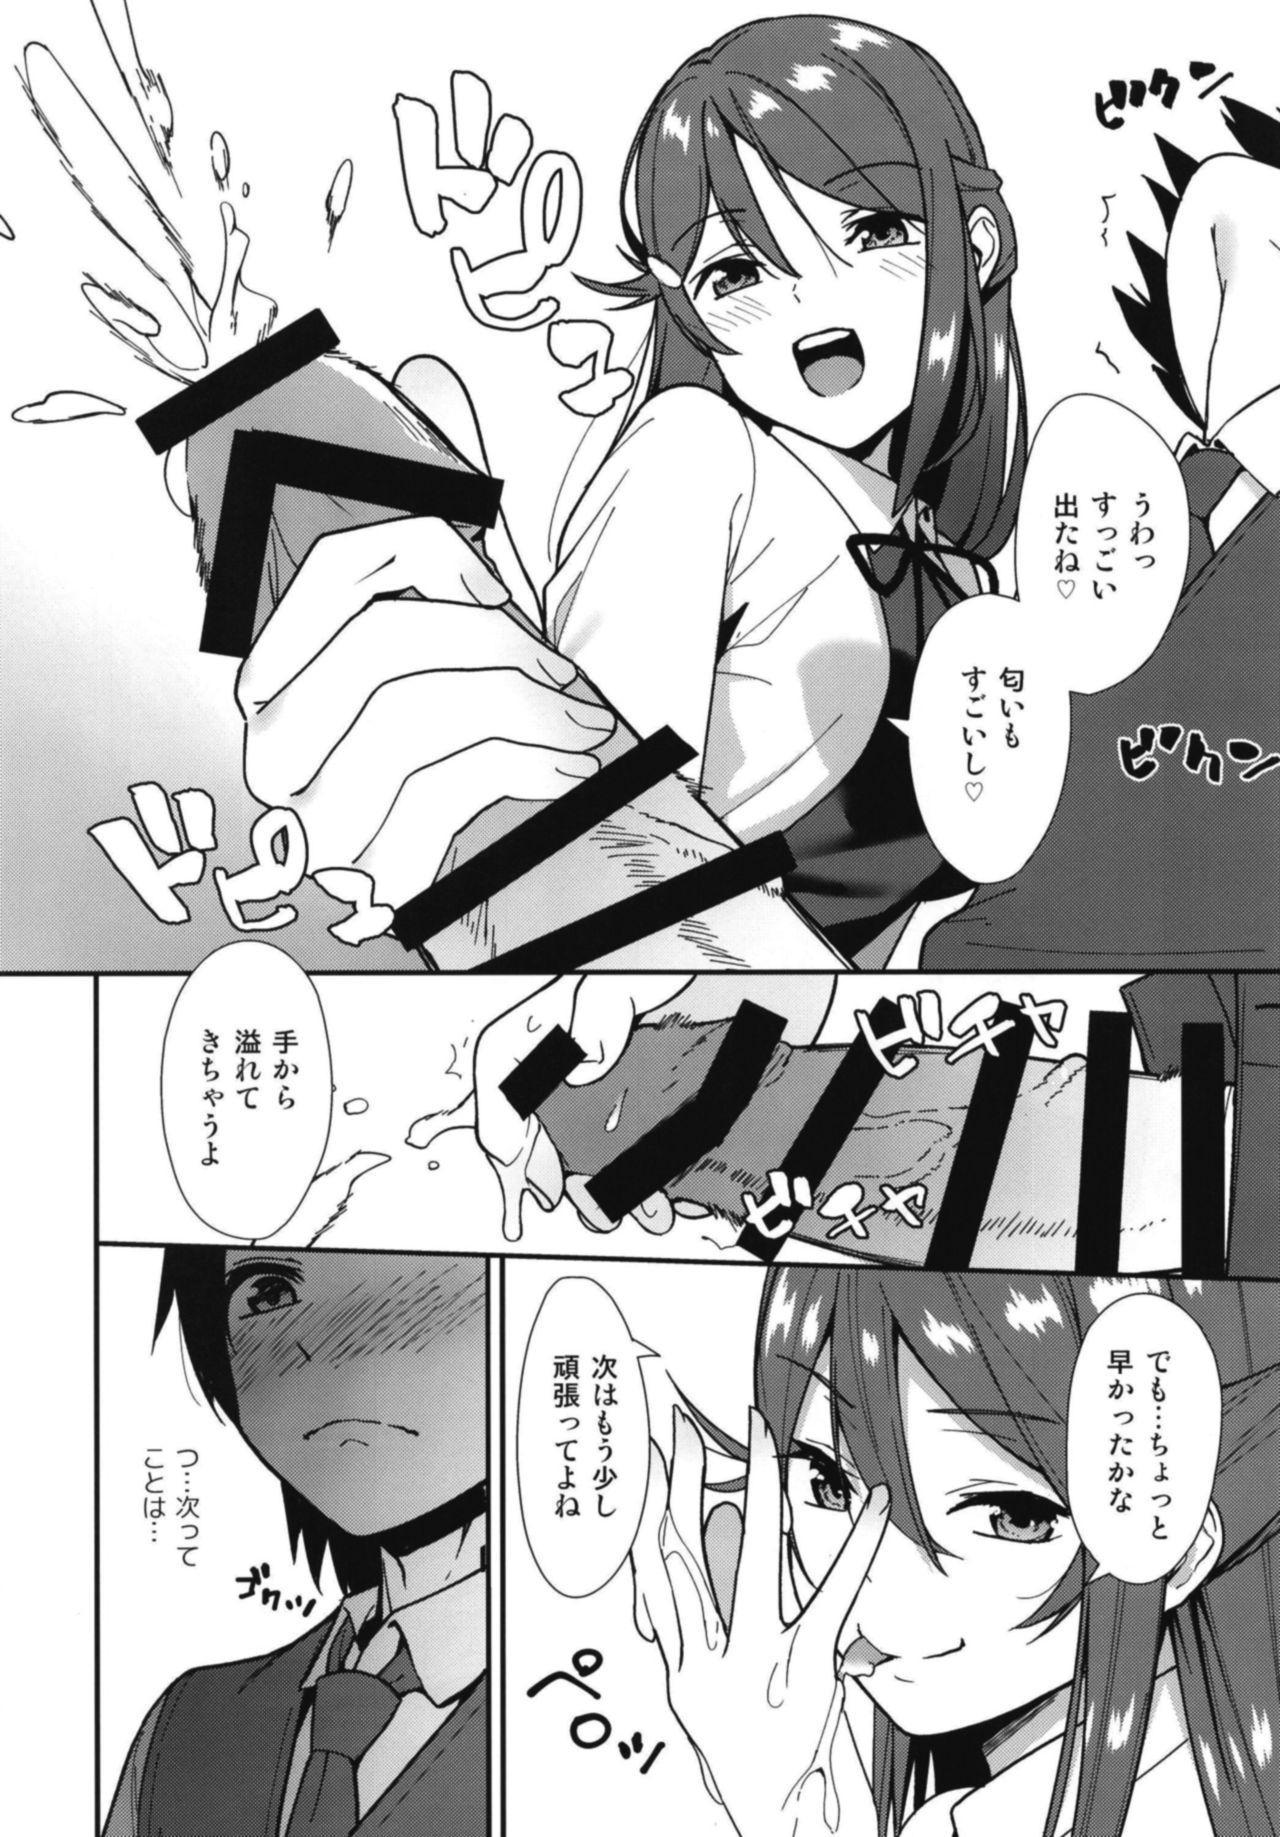 Kyou kara Hajimaru Sex Life - Start in my brand new SEX life. 9